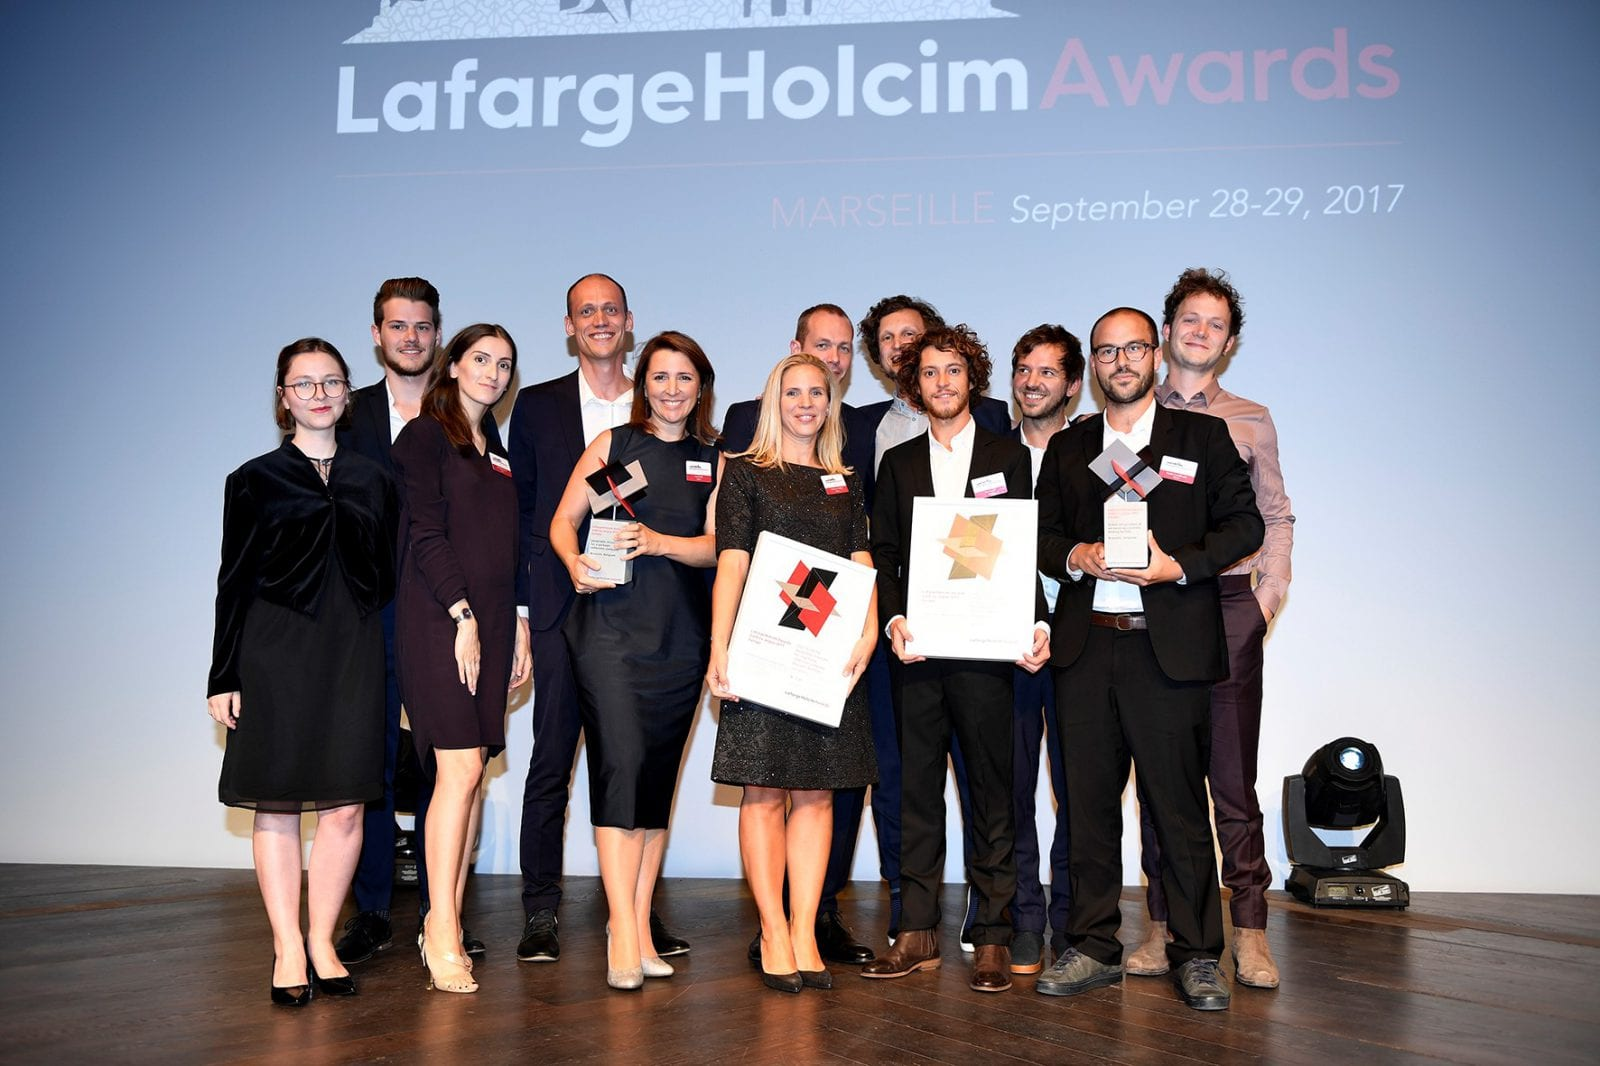 TETRA architecten und BC architects and studies aus Brüssel, bei der Preisverleihung des LafargeHolcim Award 2017 (Region Europa); Foto: LafargeHolcim